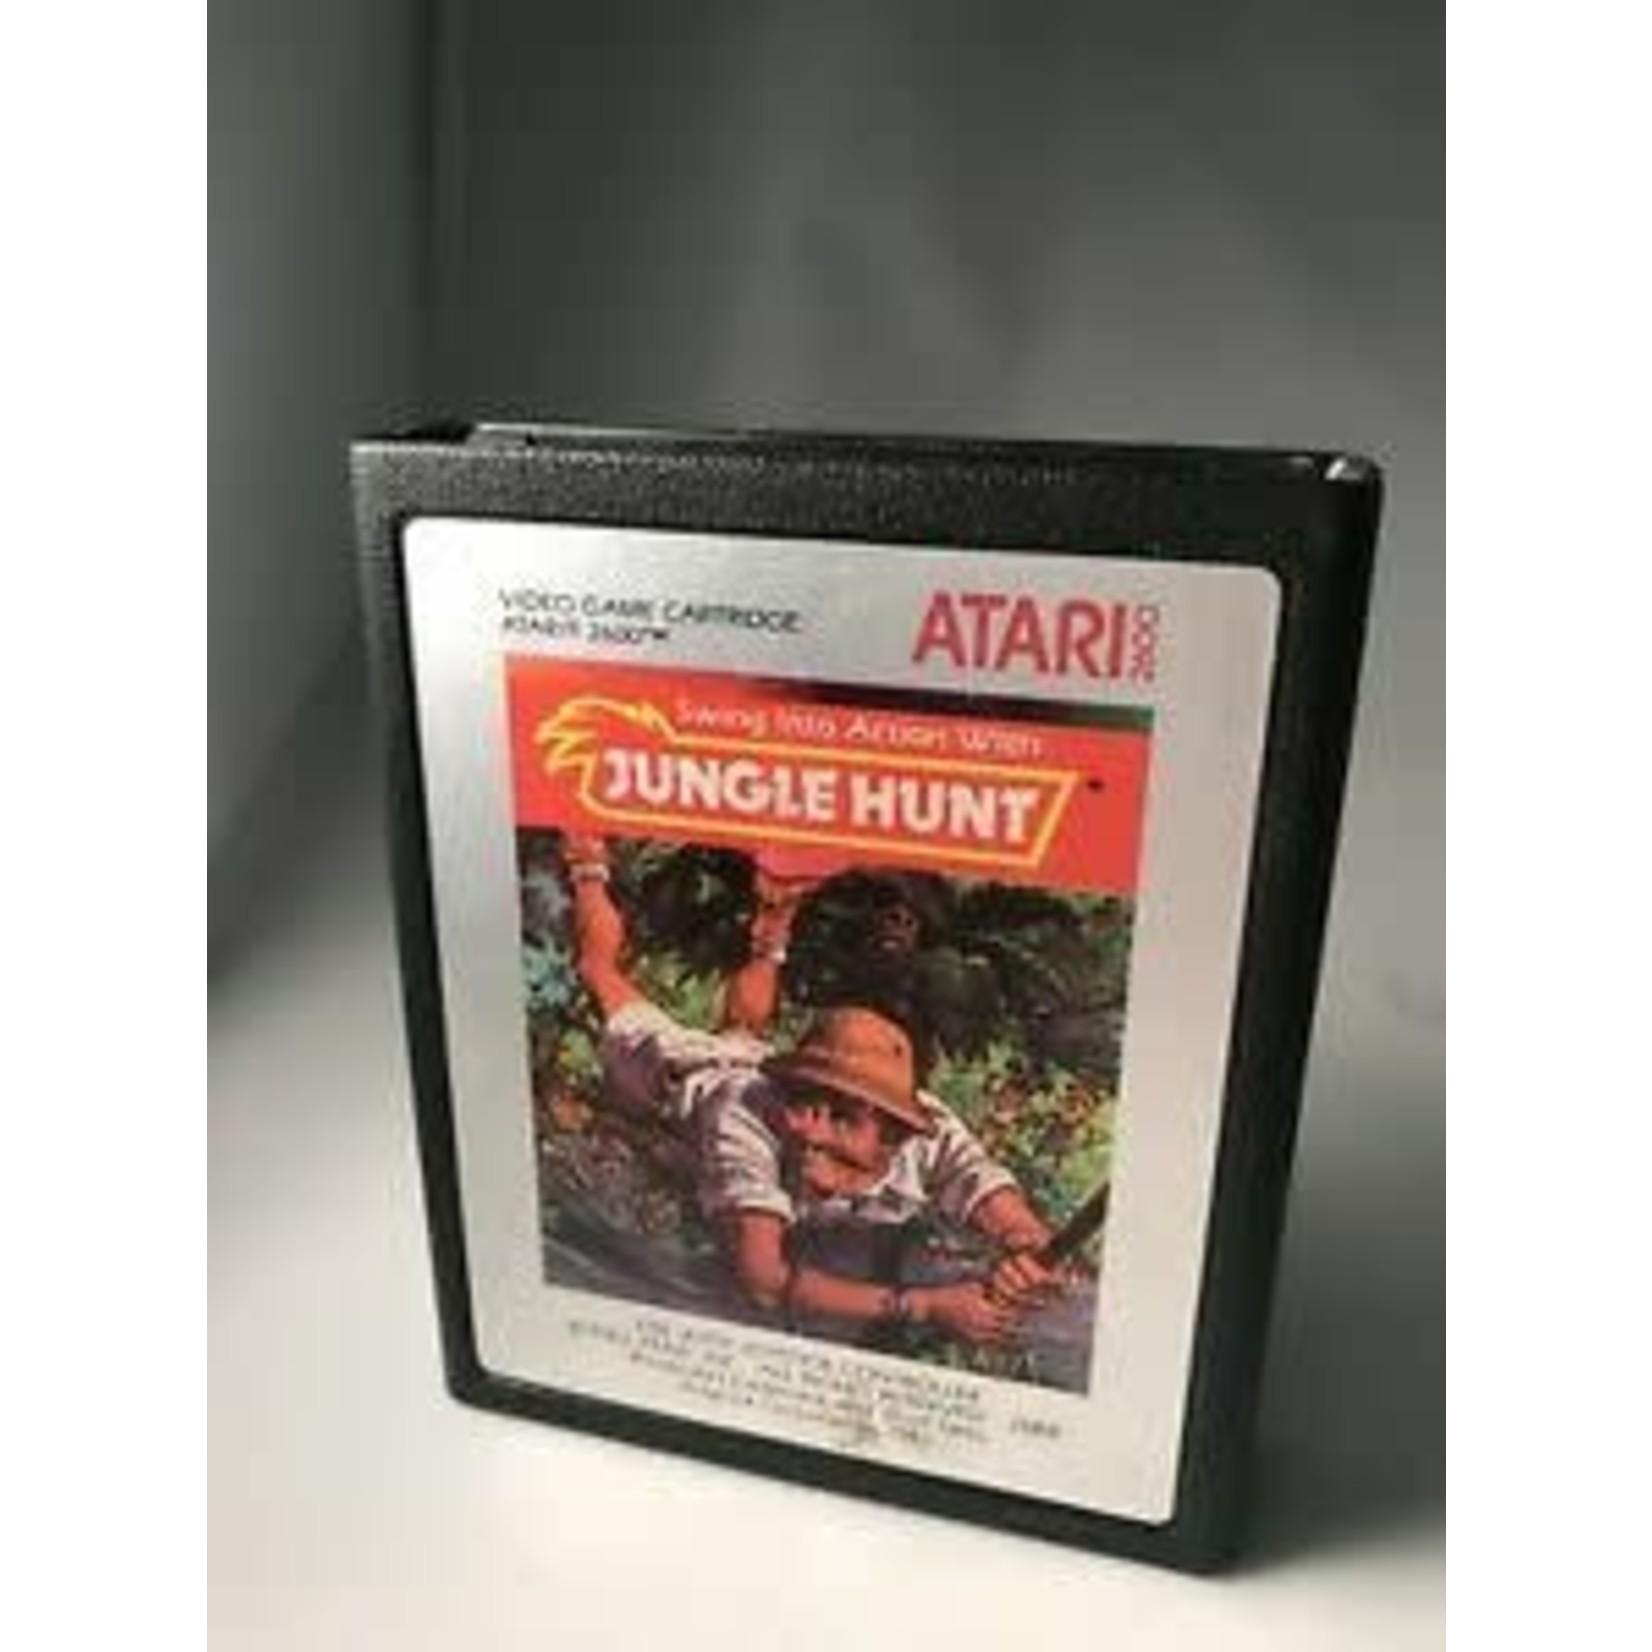 ATARIU-Jungle Hunt (CART ONLY)